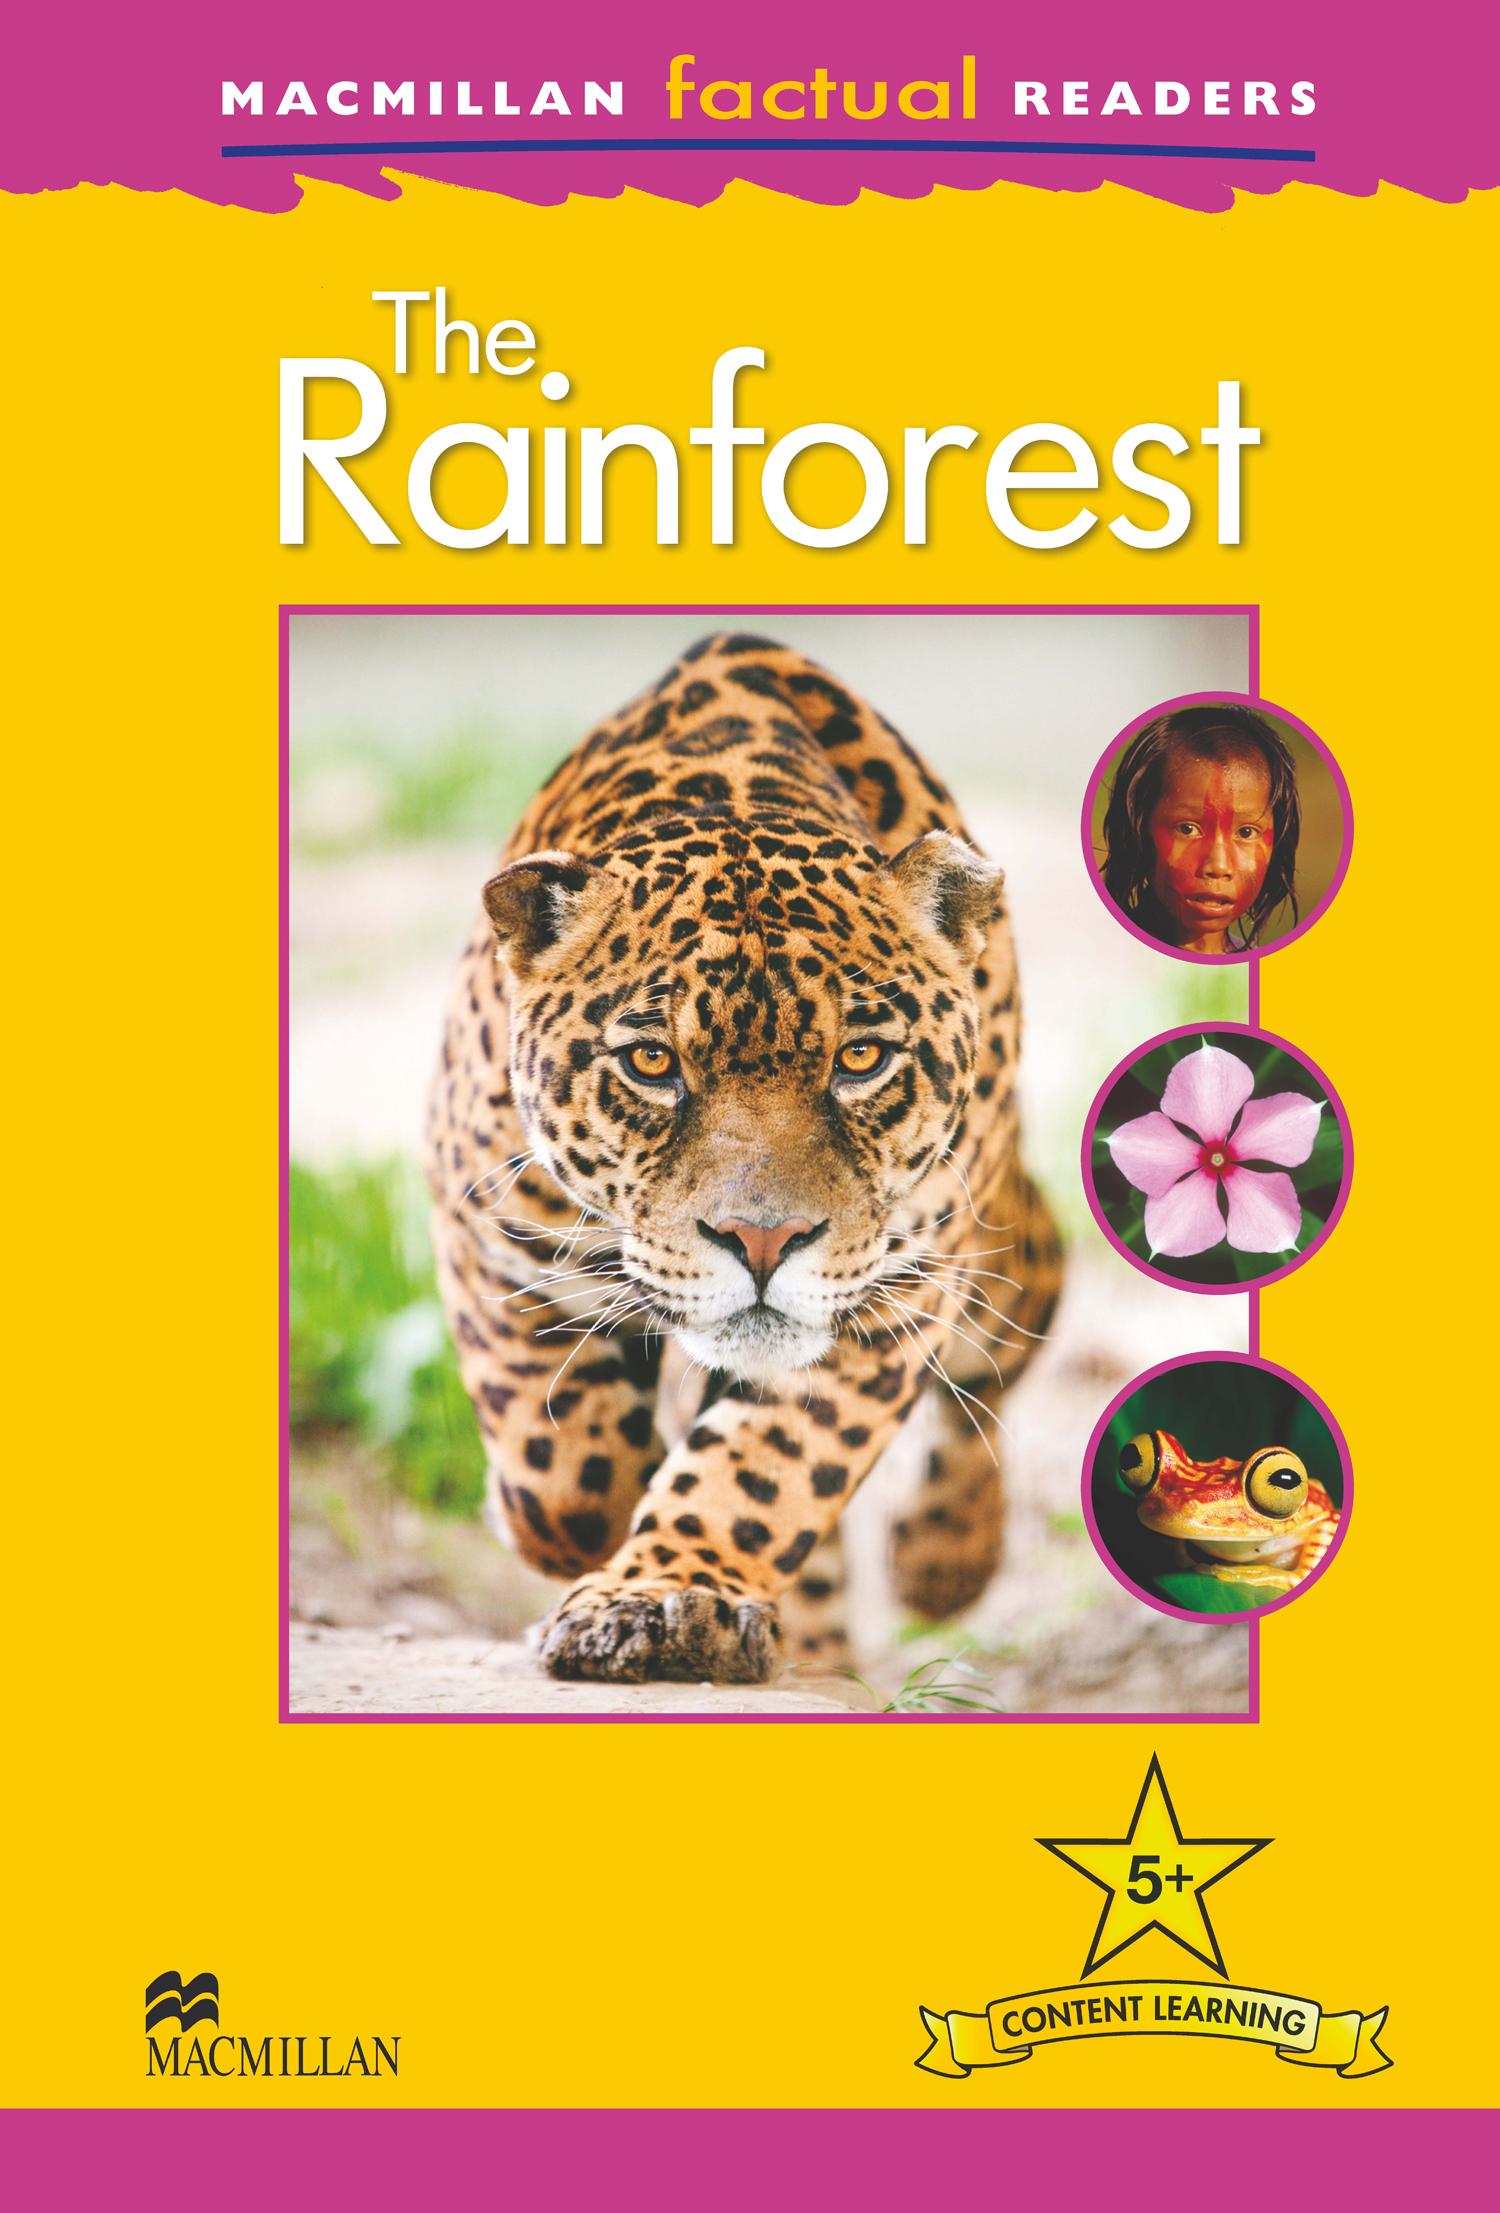 Macmillan Factual Readers: The Rainforest